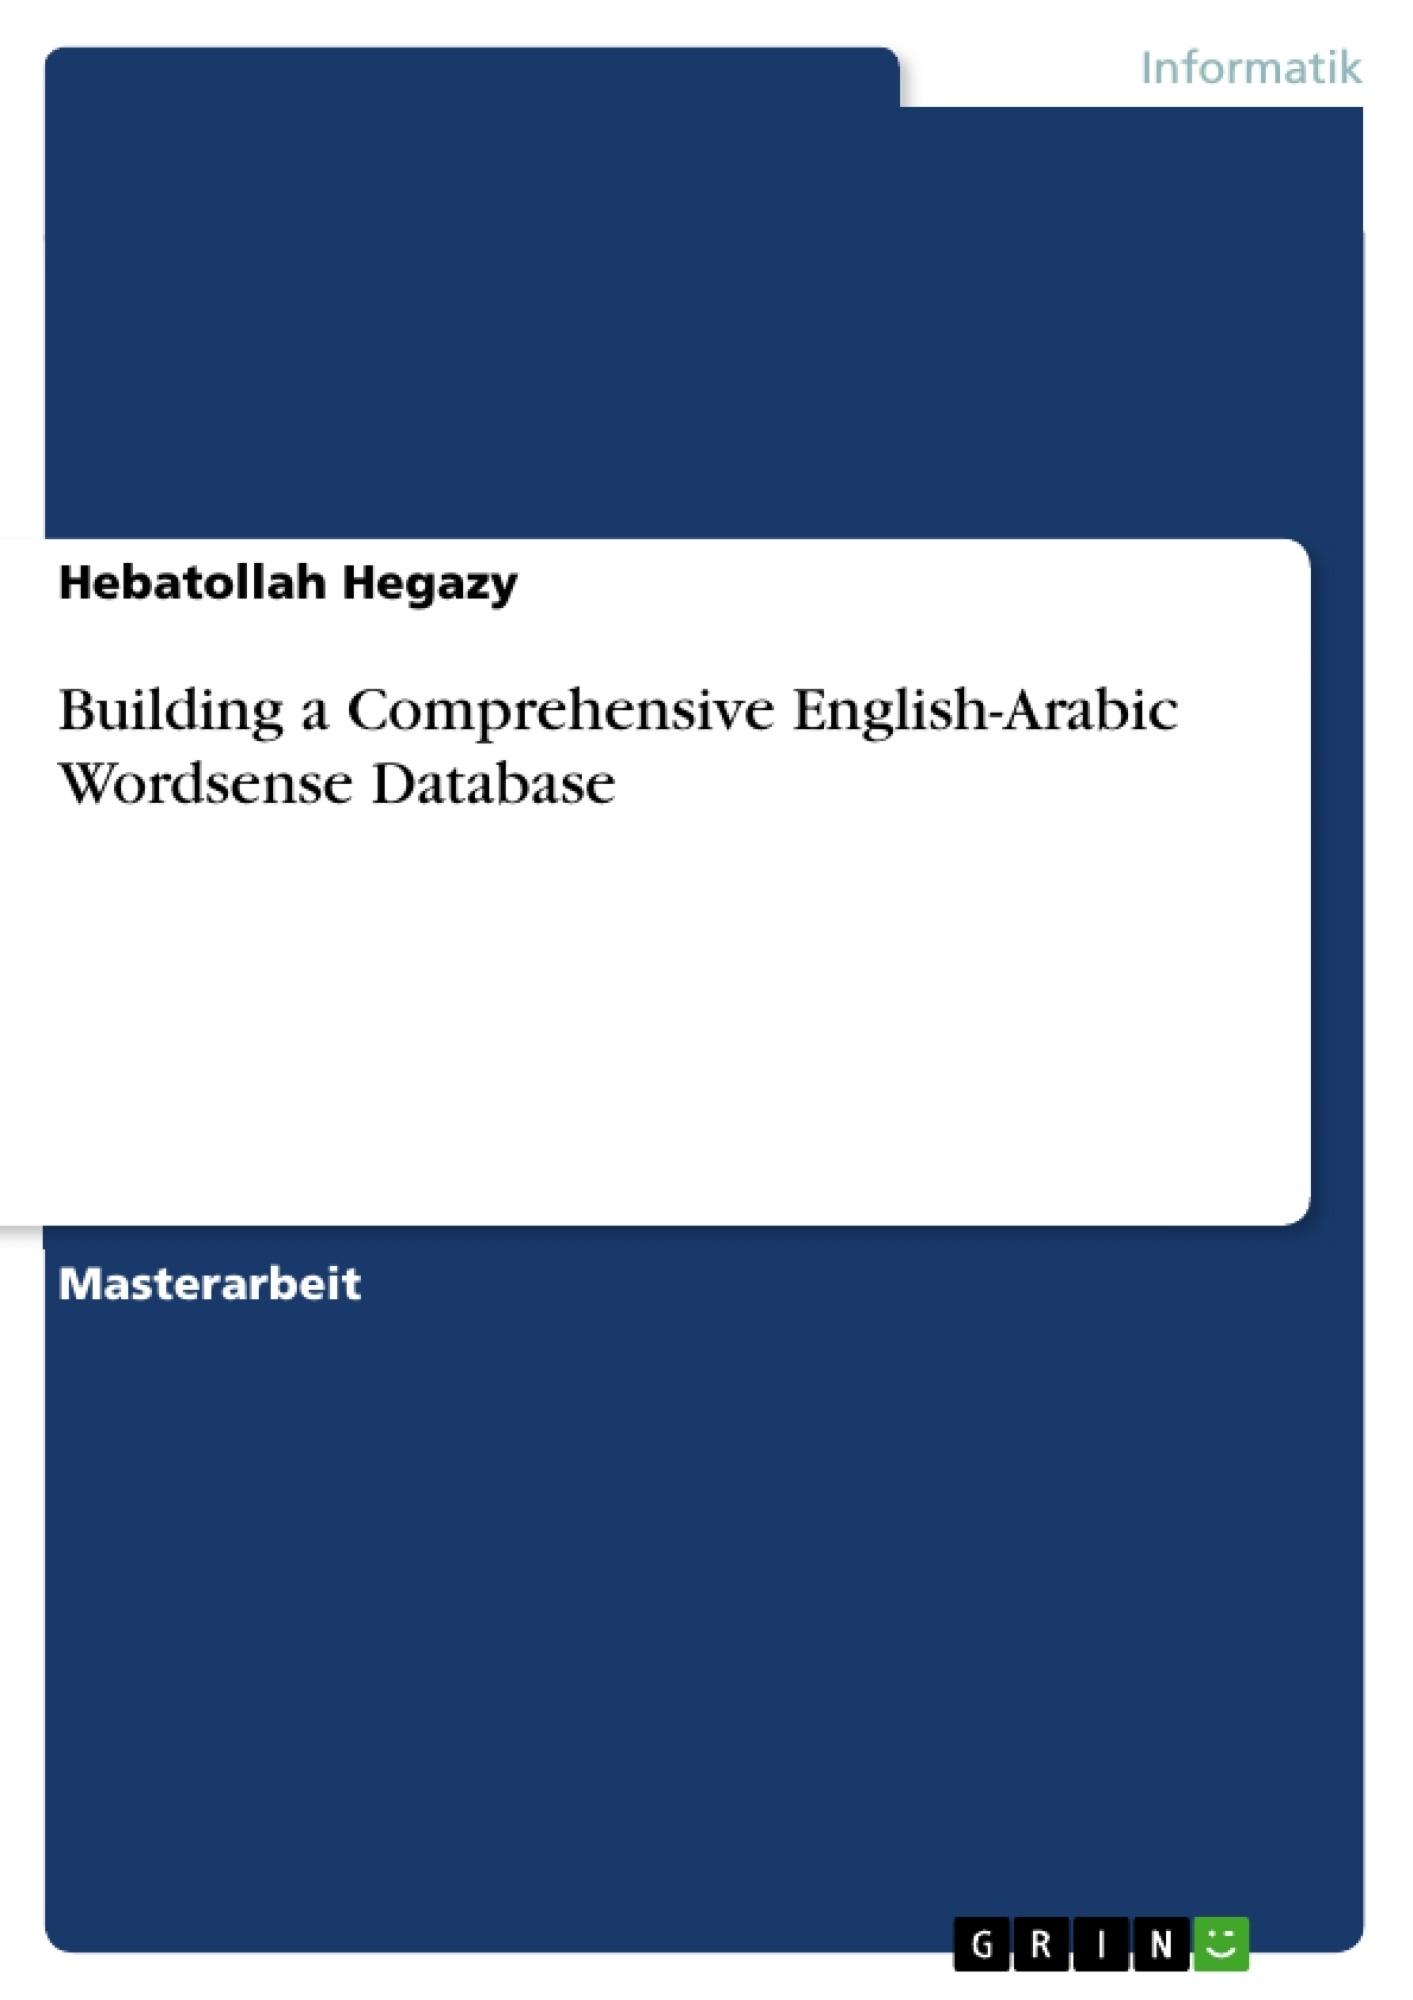 Titel: Building a Comprehensive English-Arabic Wordsense Database